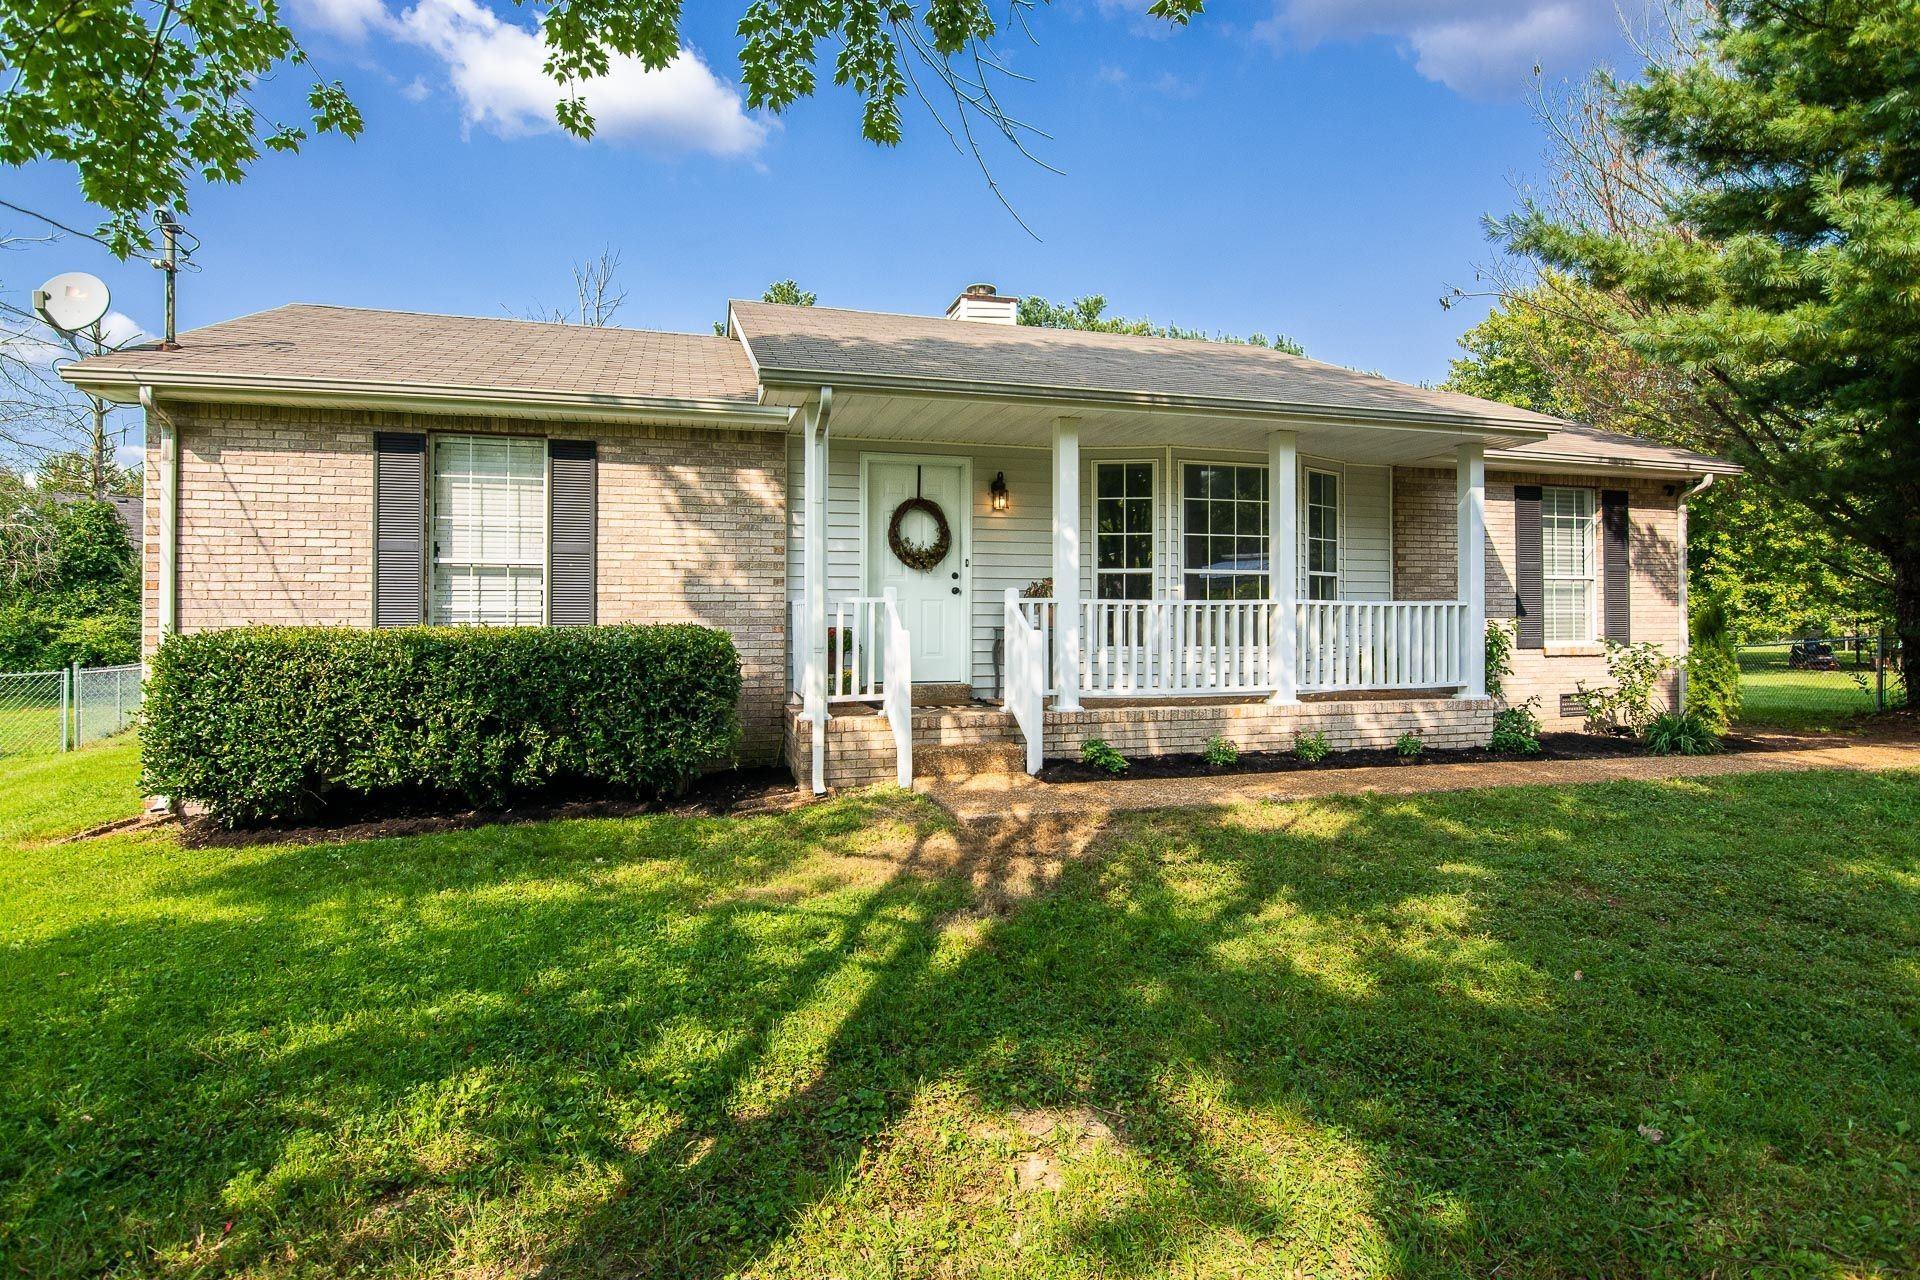 105 Pebble Creek Ct, White House, TN 37188 - MLS#: 2188169